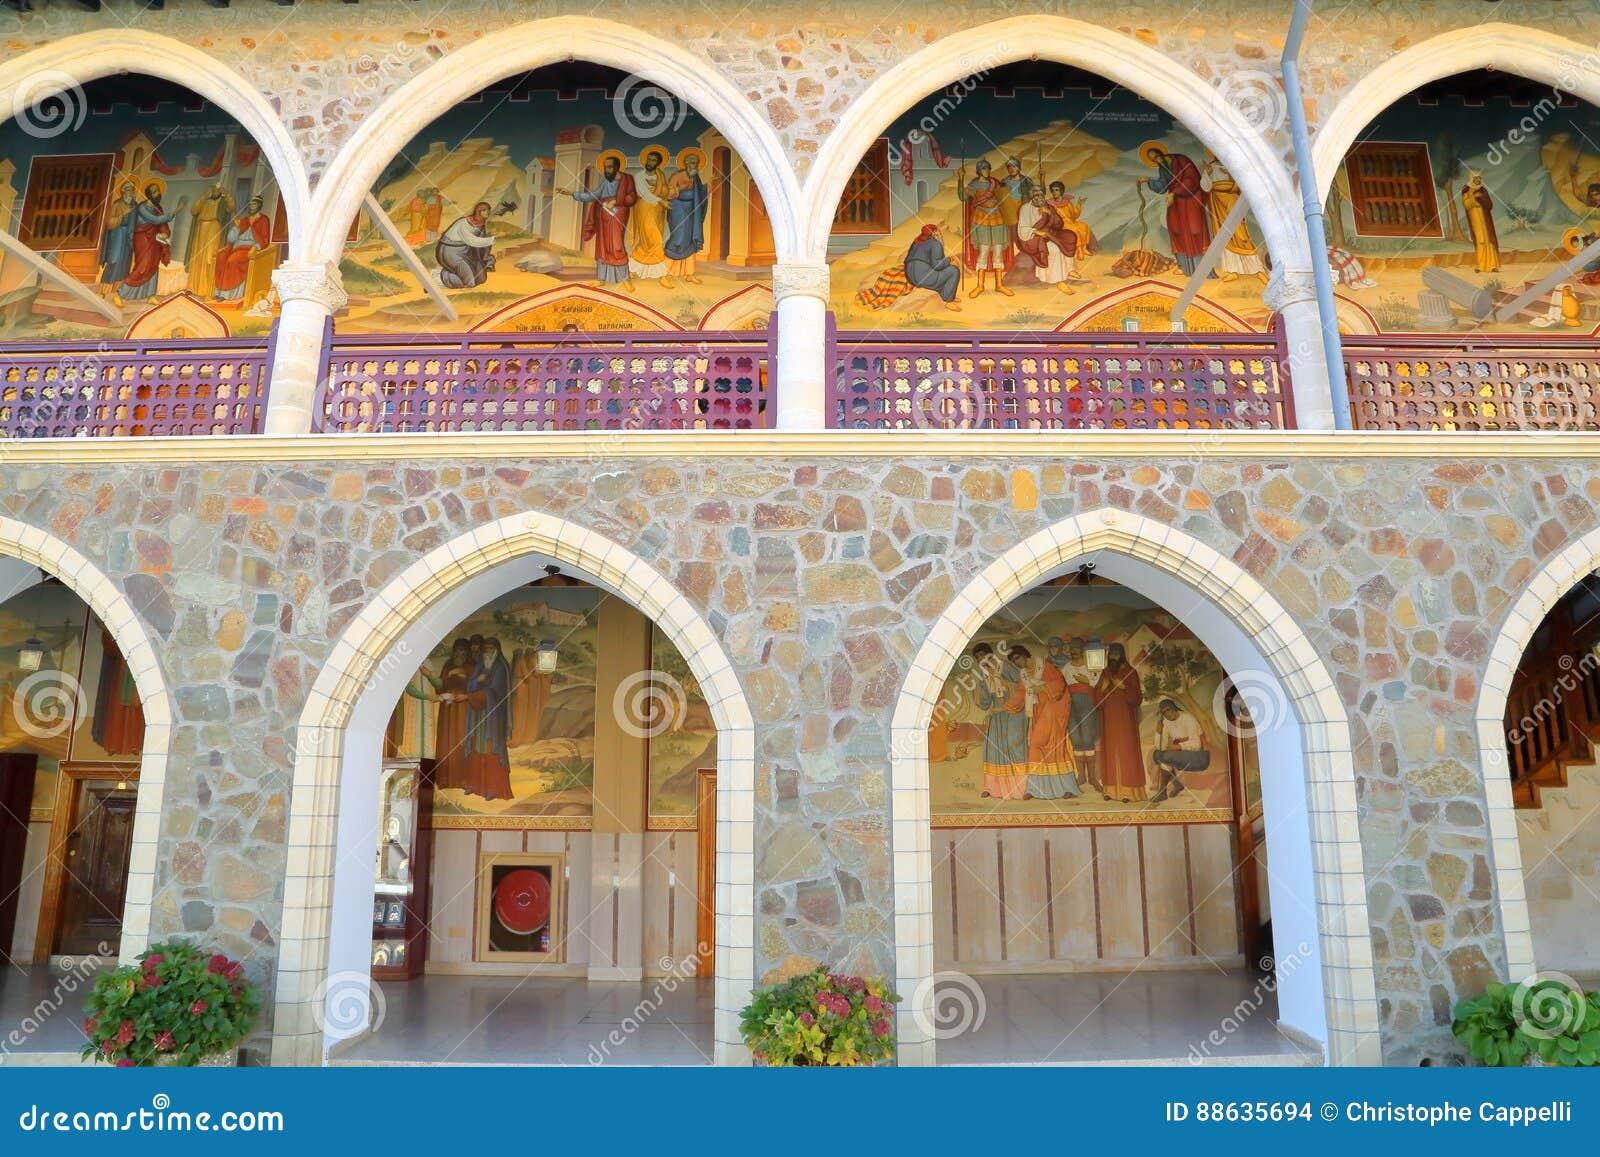 TROODOS ΒΟΥΝΑ, ΚΎΠΡΟΣ â€ «στις 18 Νοεμβρίου 2015: Τα arcades μέσα στο μοναστήρι Kykkos με τα ζωηρόχρωμα μωσαϊκά